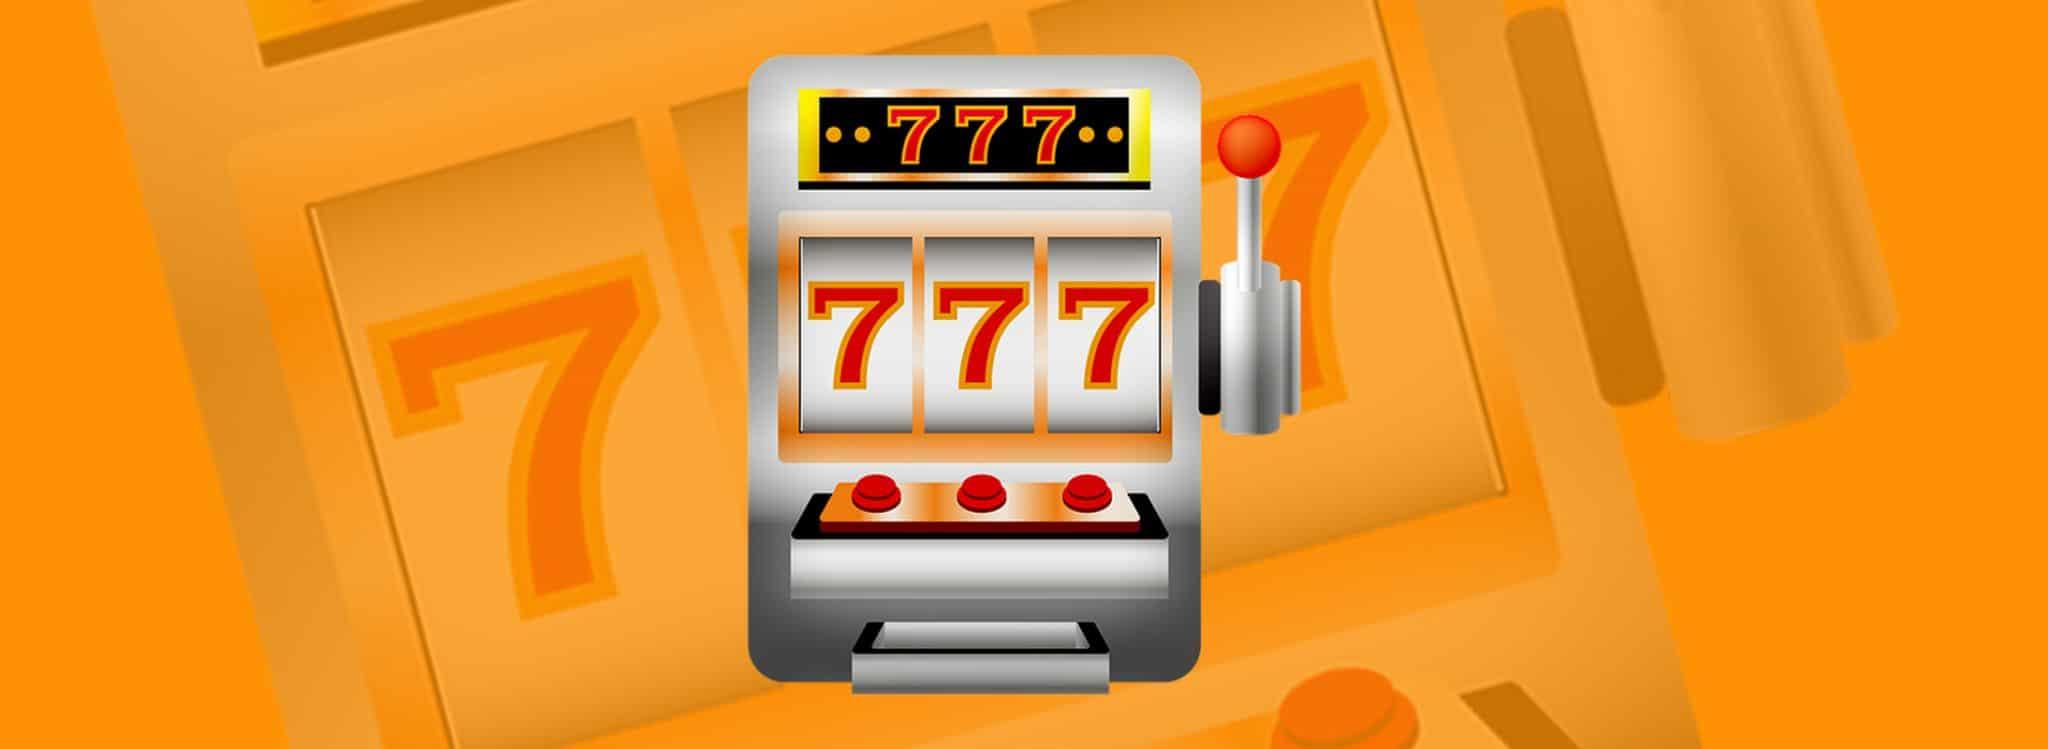 Canadian Wins Life-Changing Jackpot element02 - CasinoTop